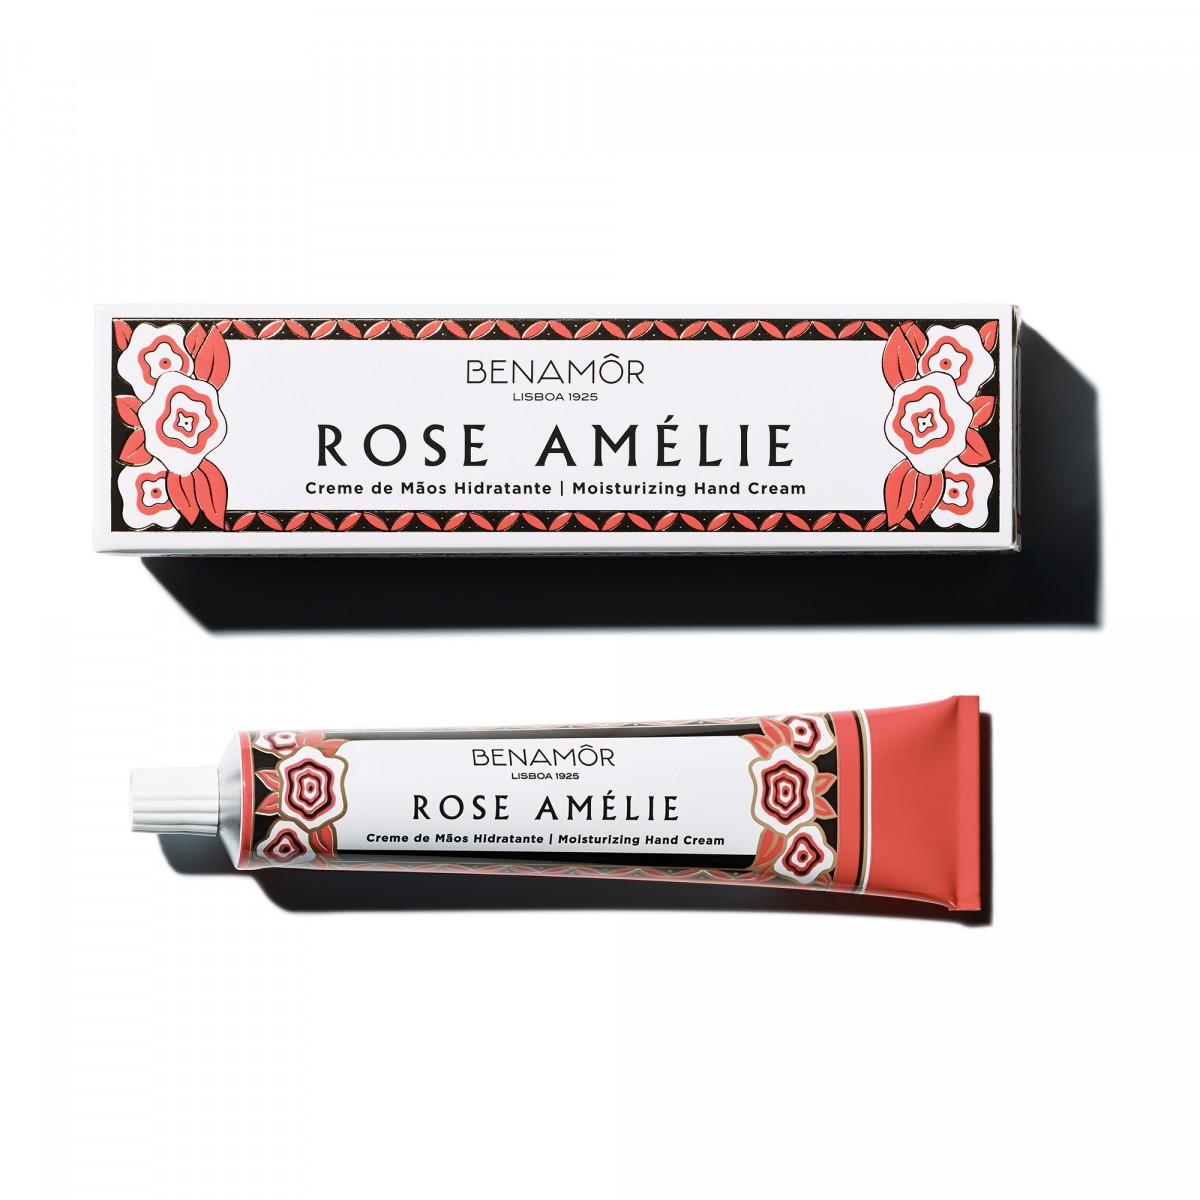 Benamor Rose Amelie Protective Hand Cream 50ml